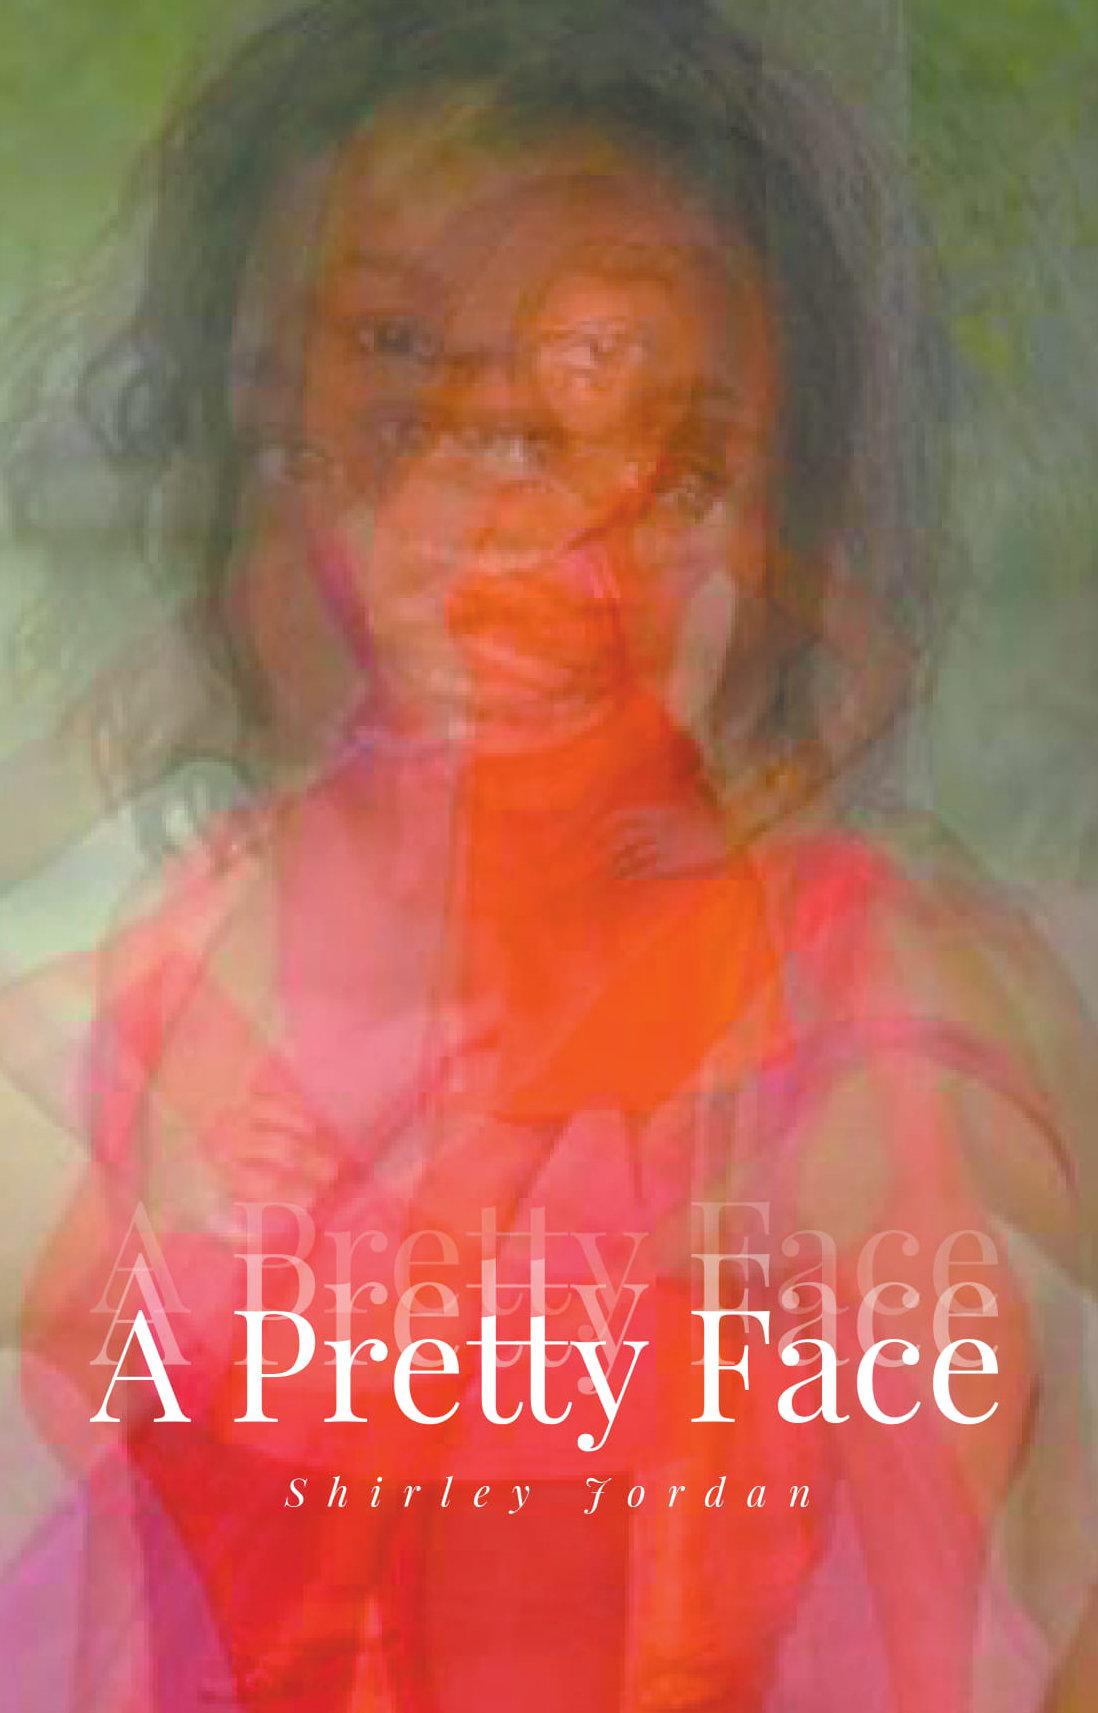 Shirley Jordan -  A Pretty Face